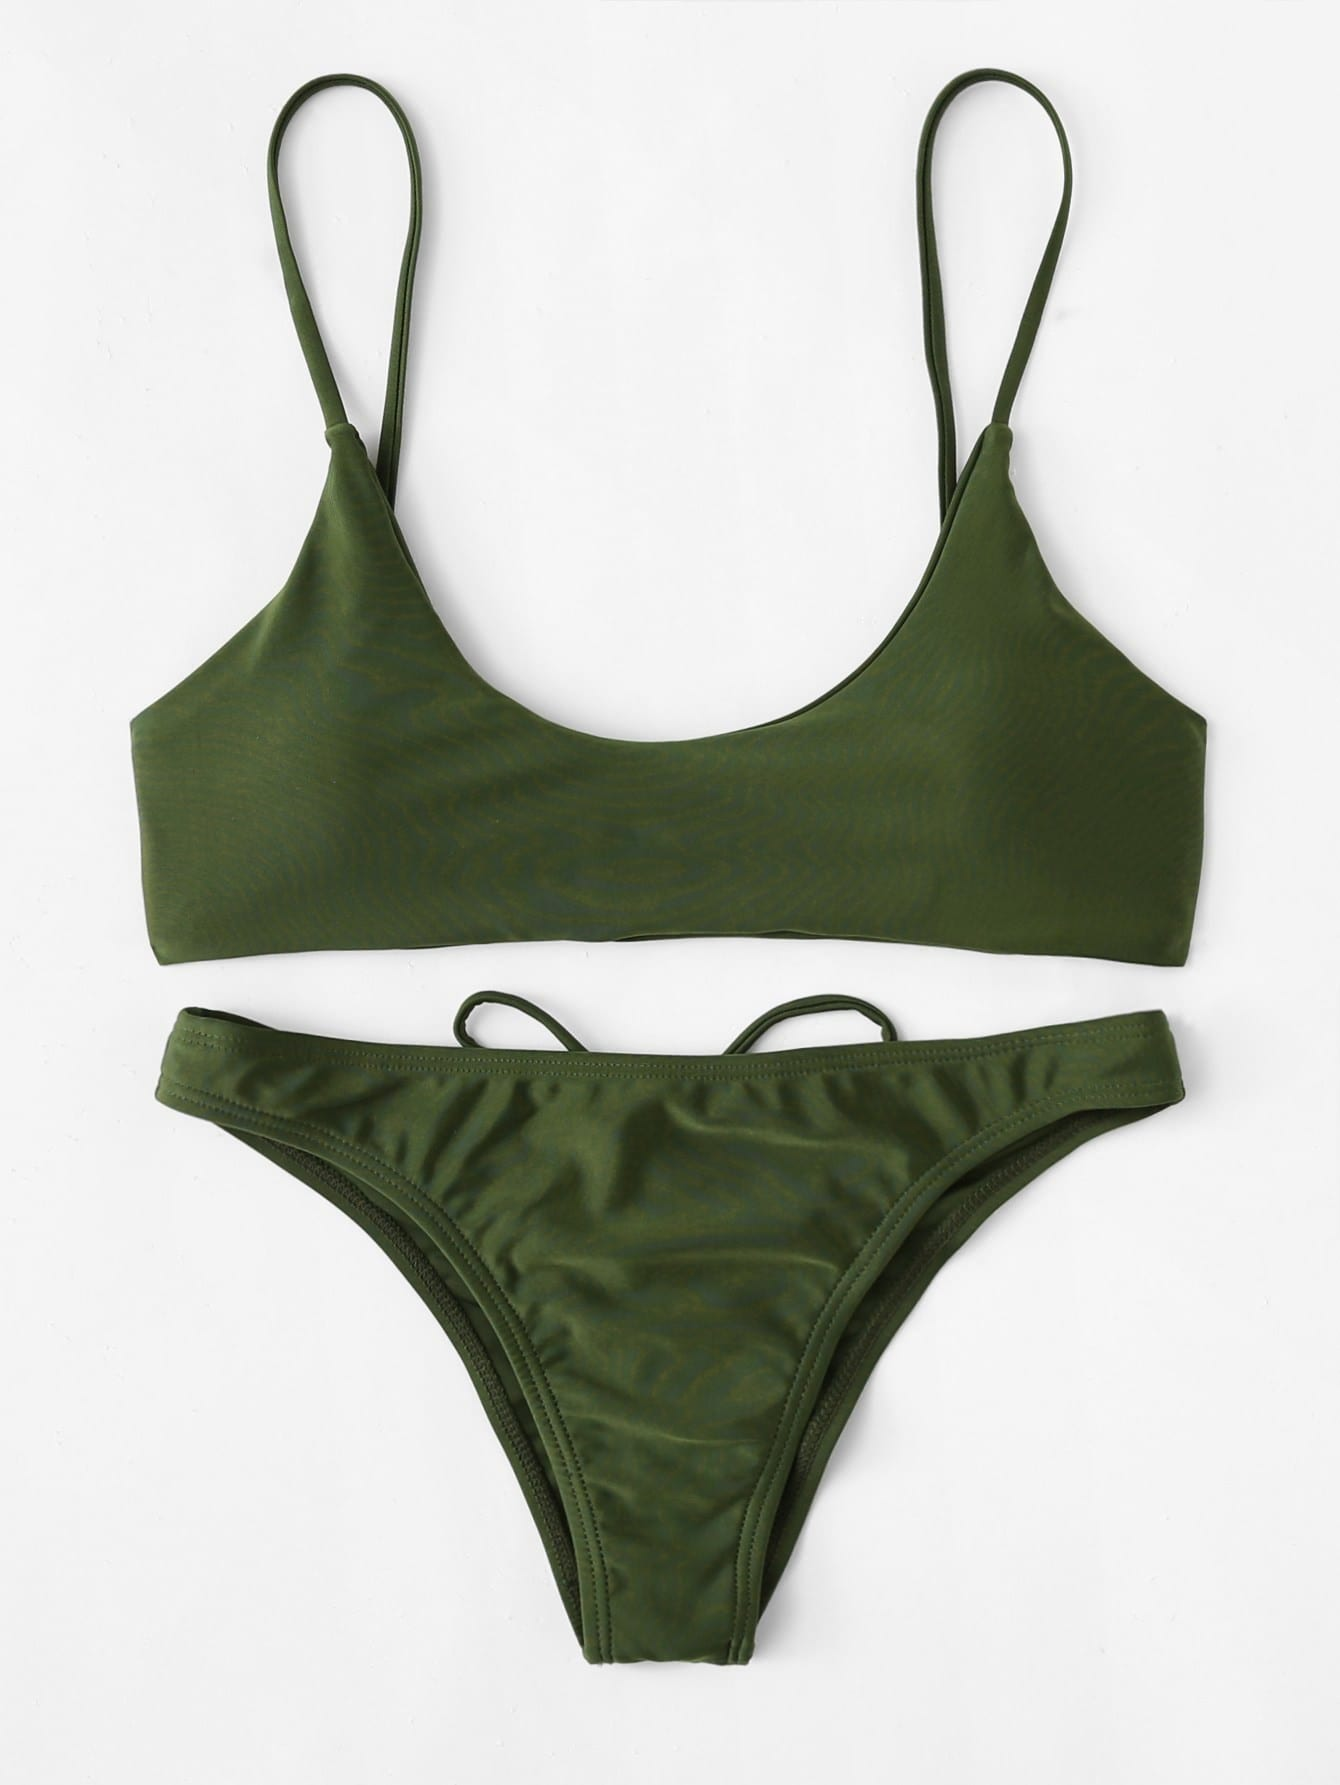 Criss Cross Drawstring Bikini Set criss cross ruffle bikini set